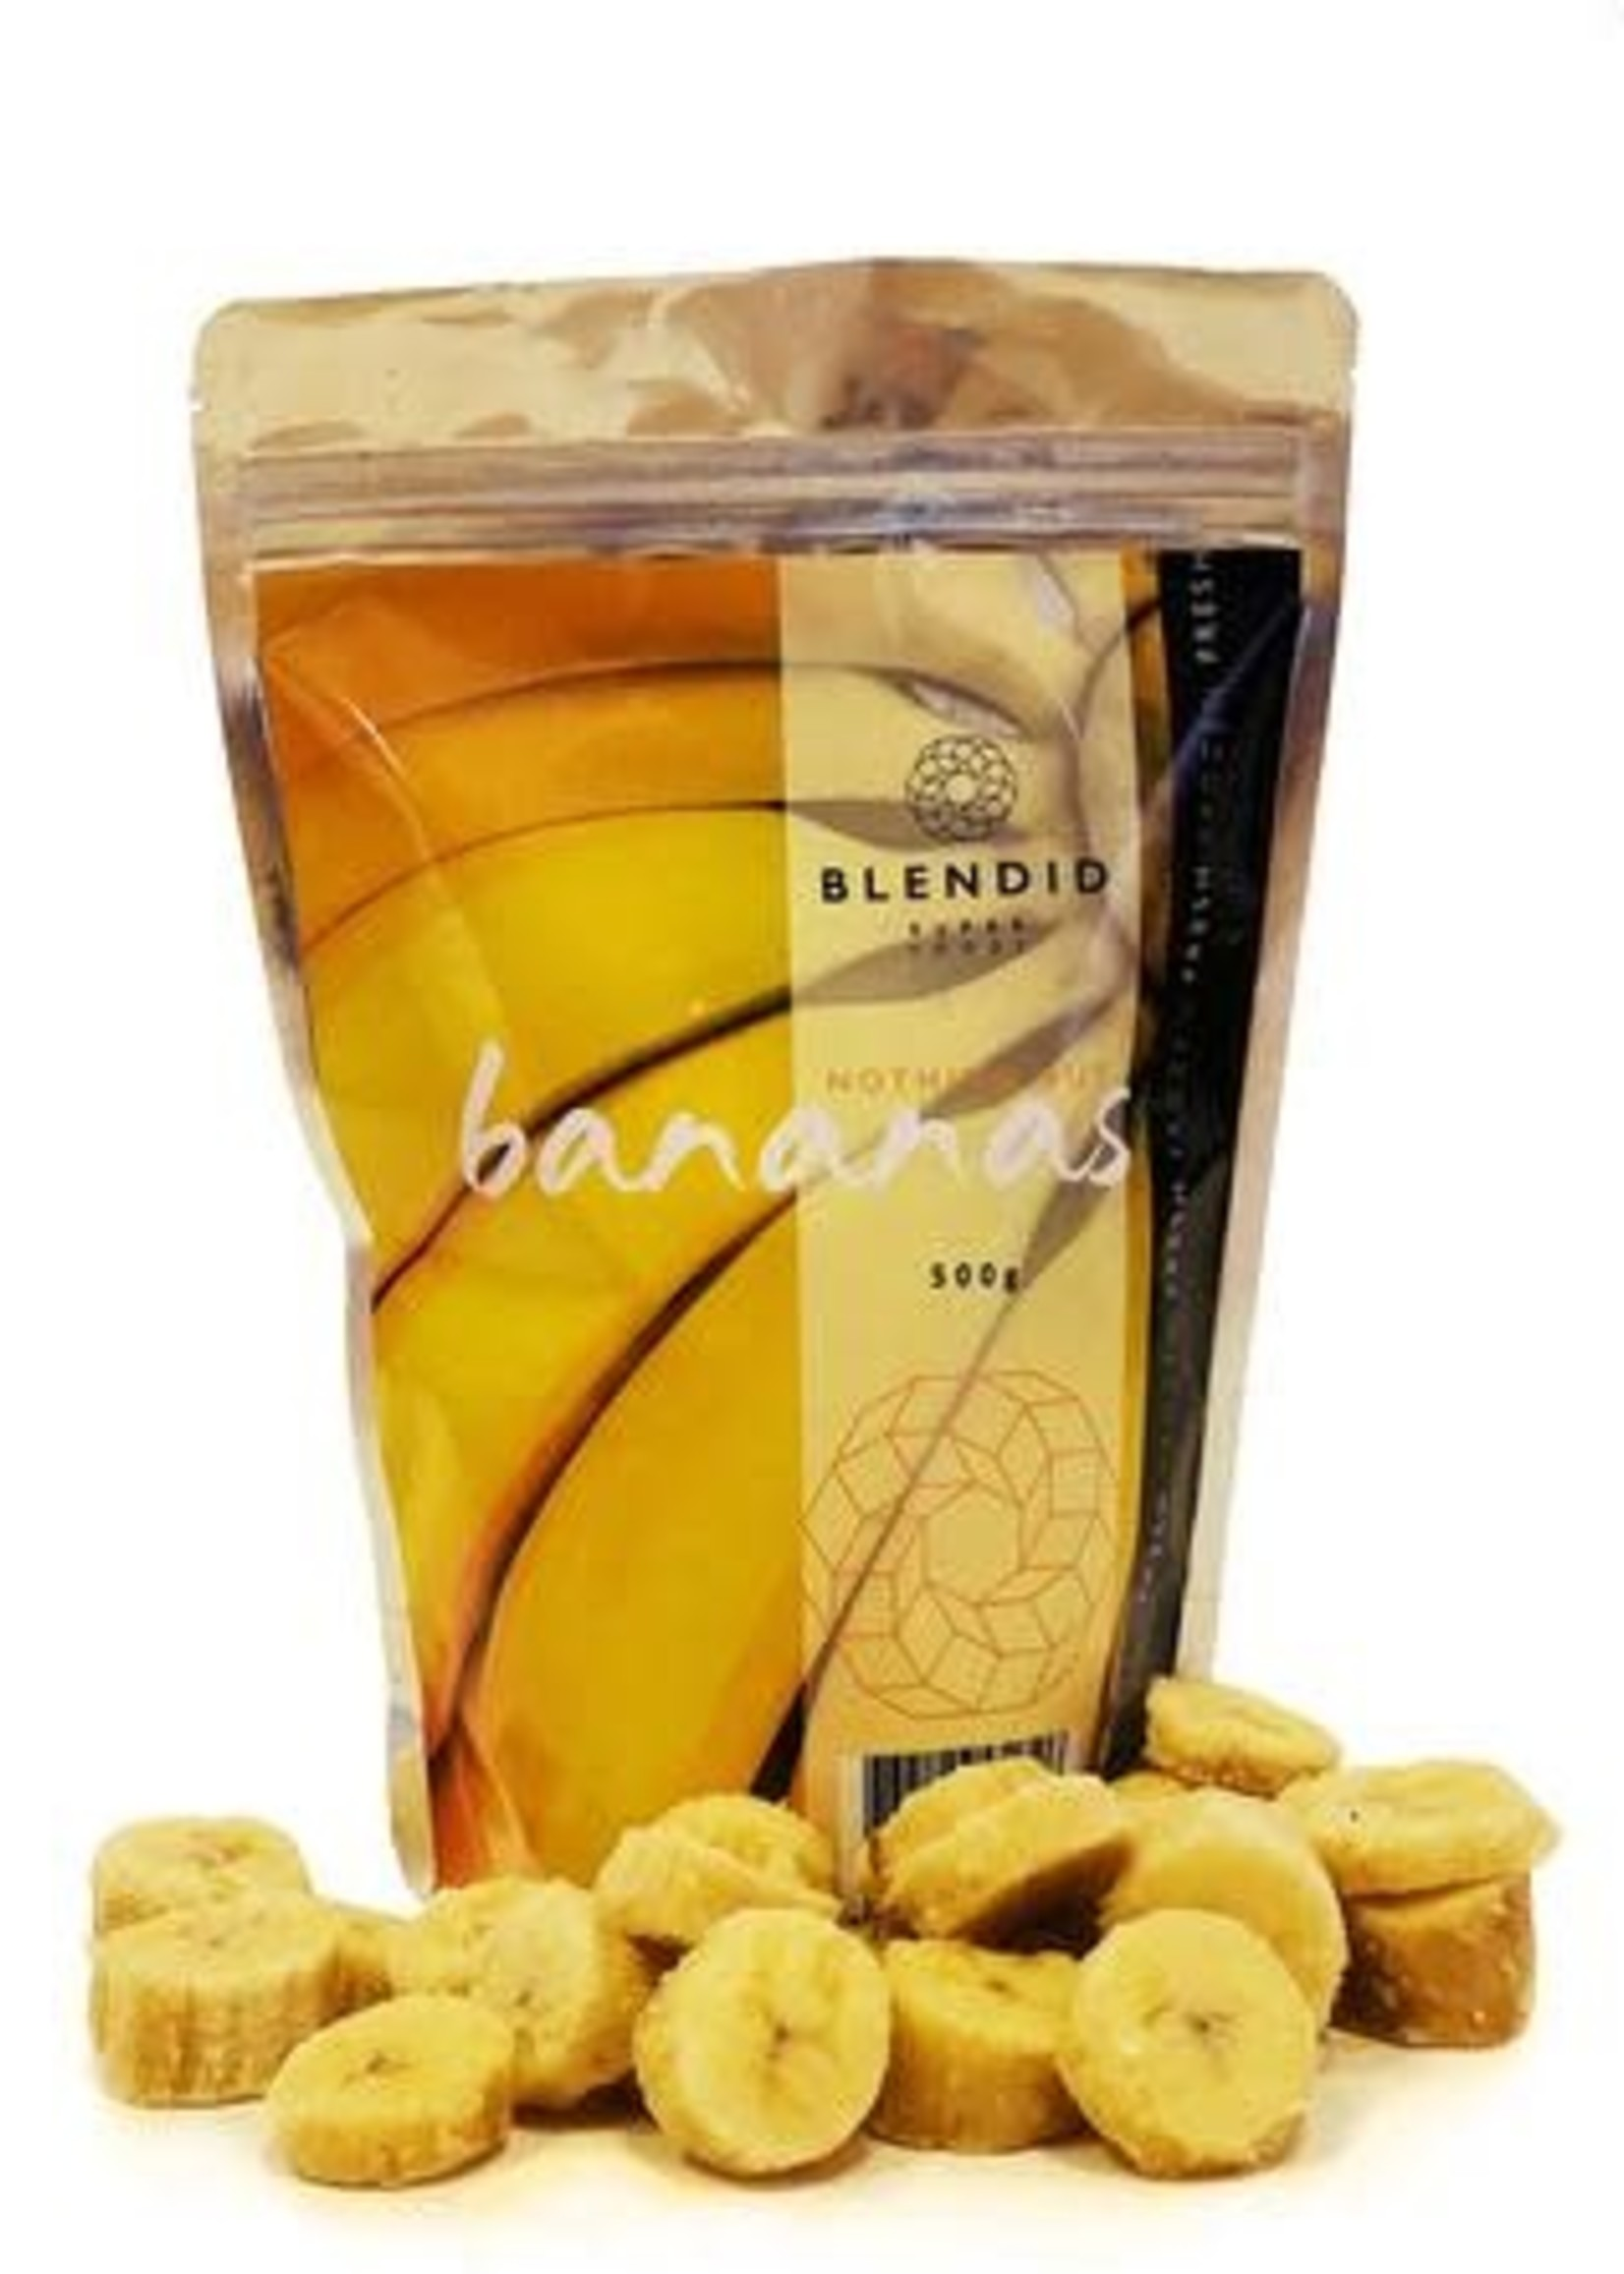 Blendid Blendid - Frozen banana